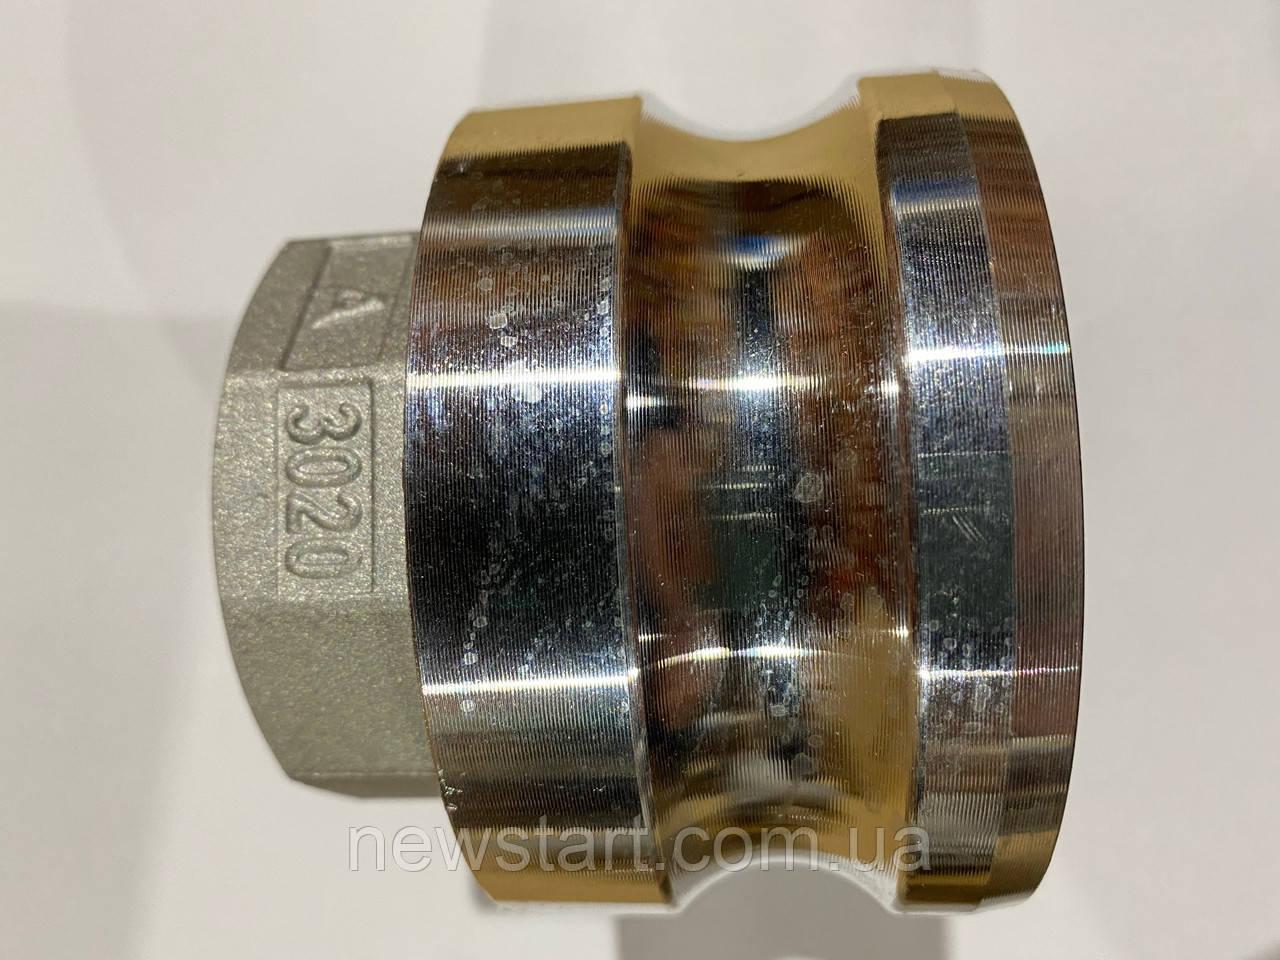 Камлок редукционный тип AR (camlock) алюминий